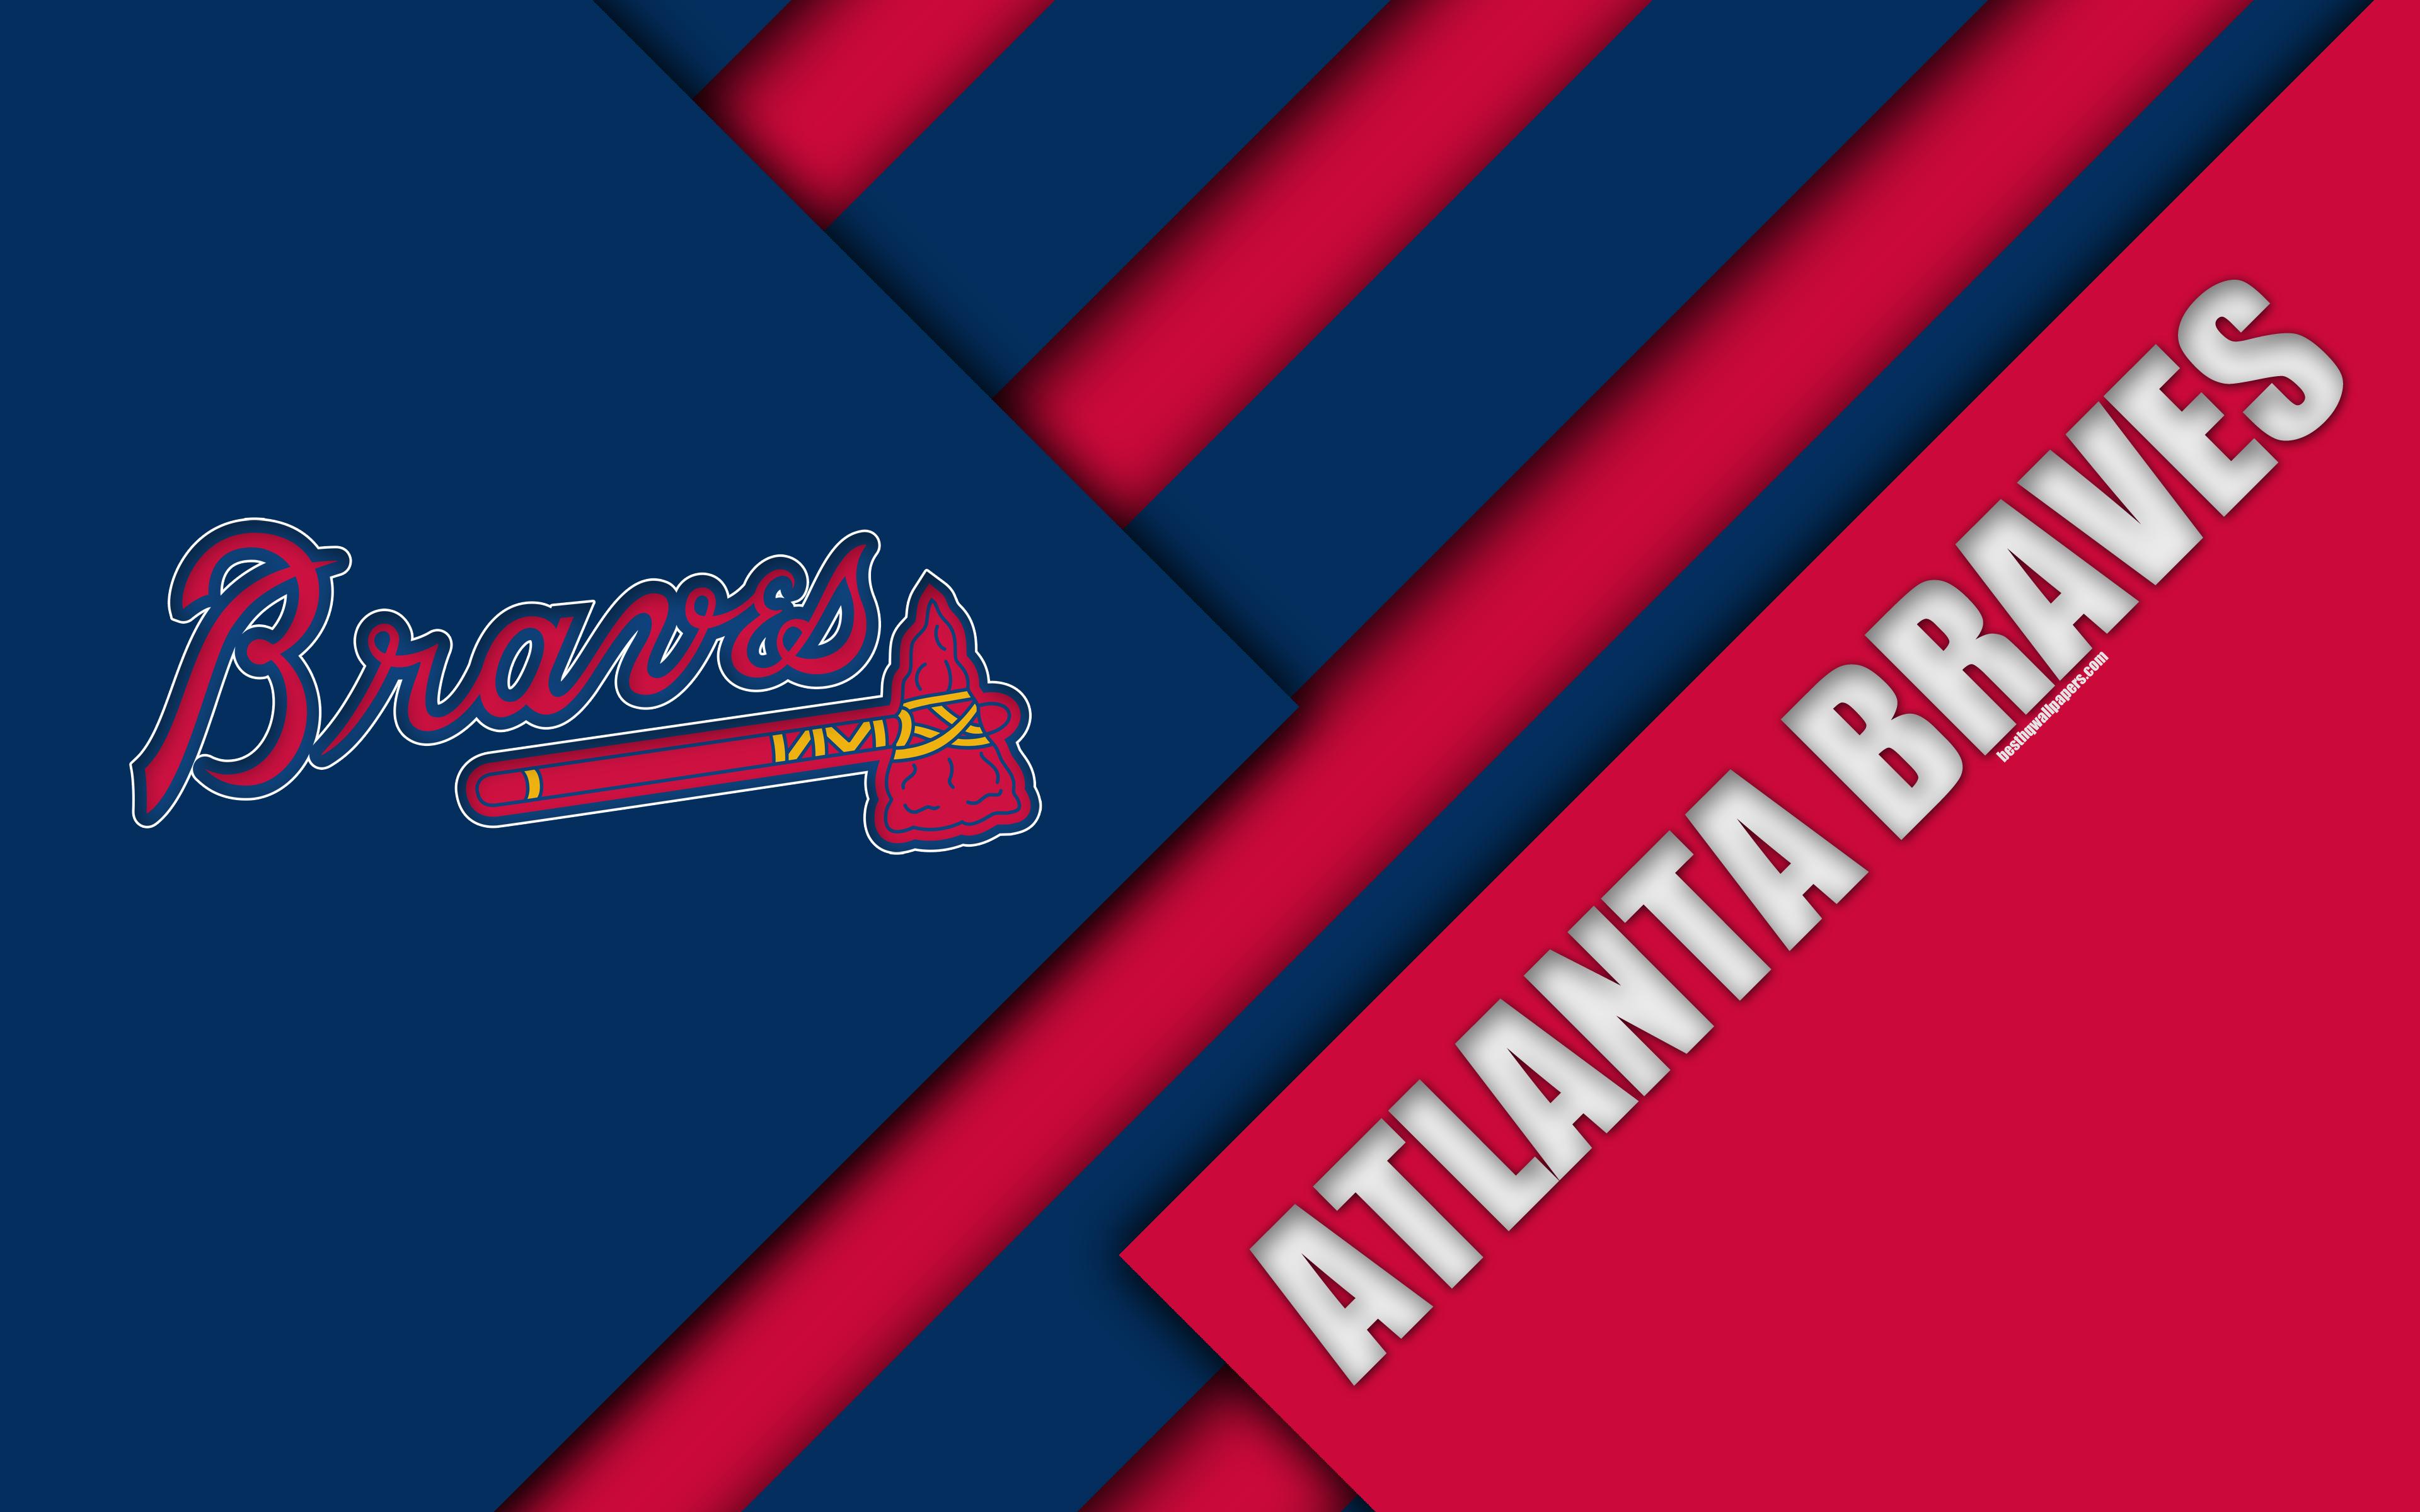 Atlanta Braves 2019 Wallpapers Wallpaper Cave